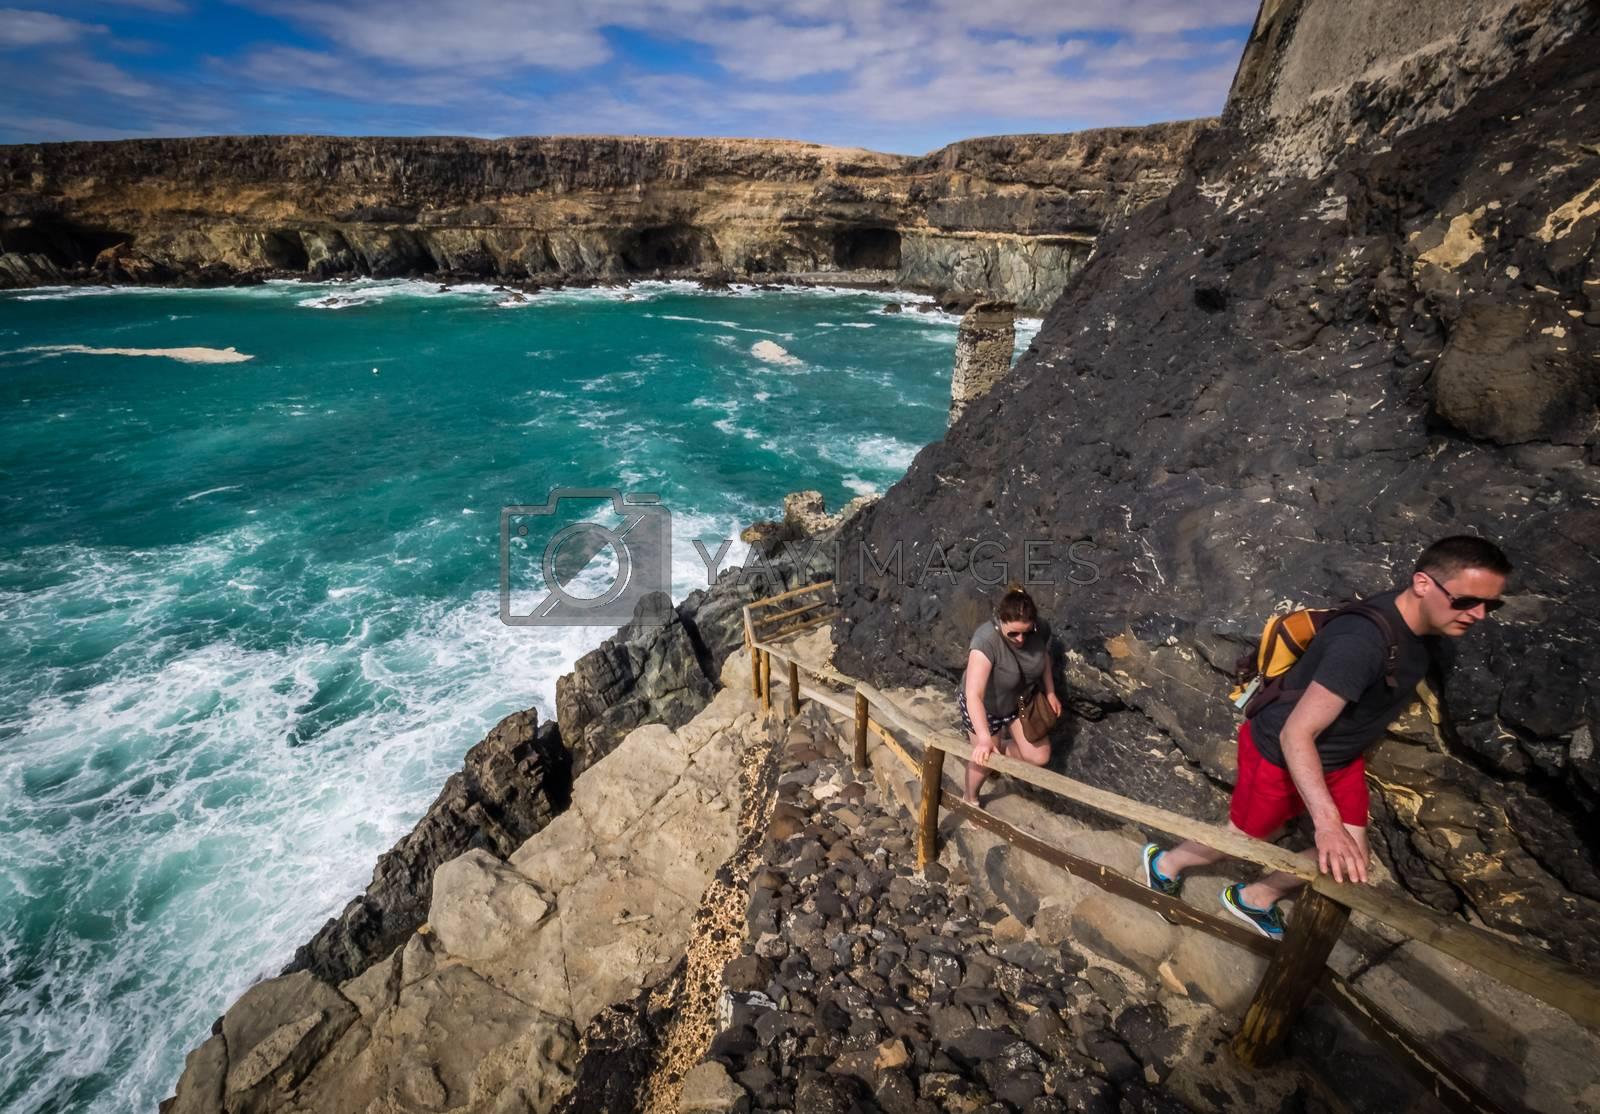 Tourists trekking along the coastline in Ajuy, Parque Rural de Betancuria in Fuerteventura, Canary Island, Spain. Picture taken 13 April 2016